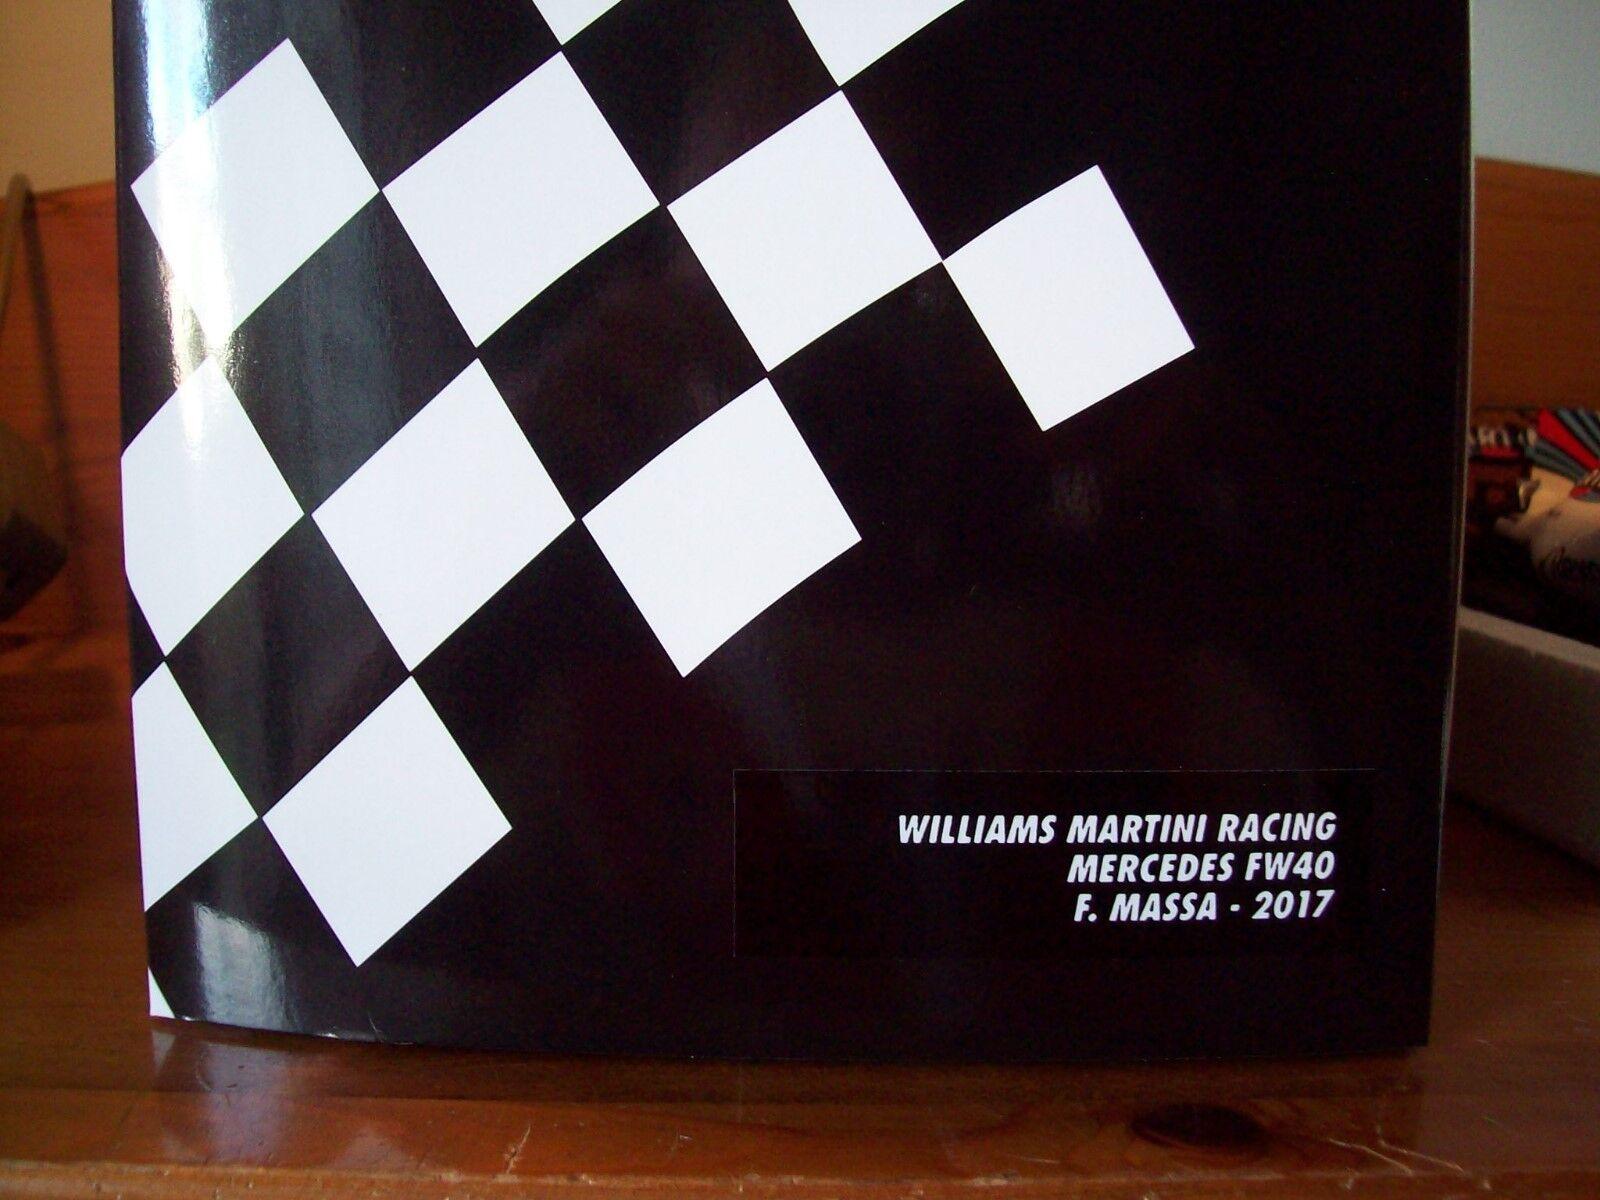 1 18 MINICHAMPS WILLIAMS MARTINI RACING MERCEDES FW40 FELIPE MASSA 2017